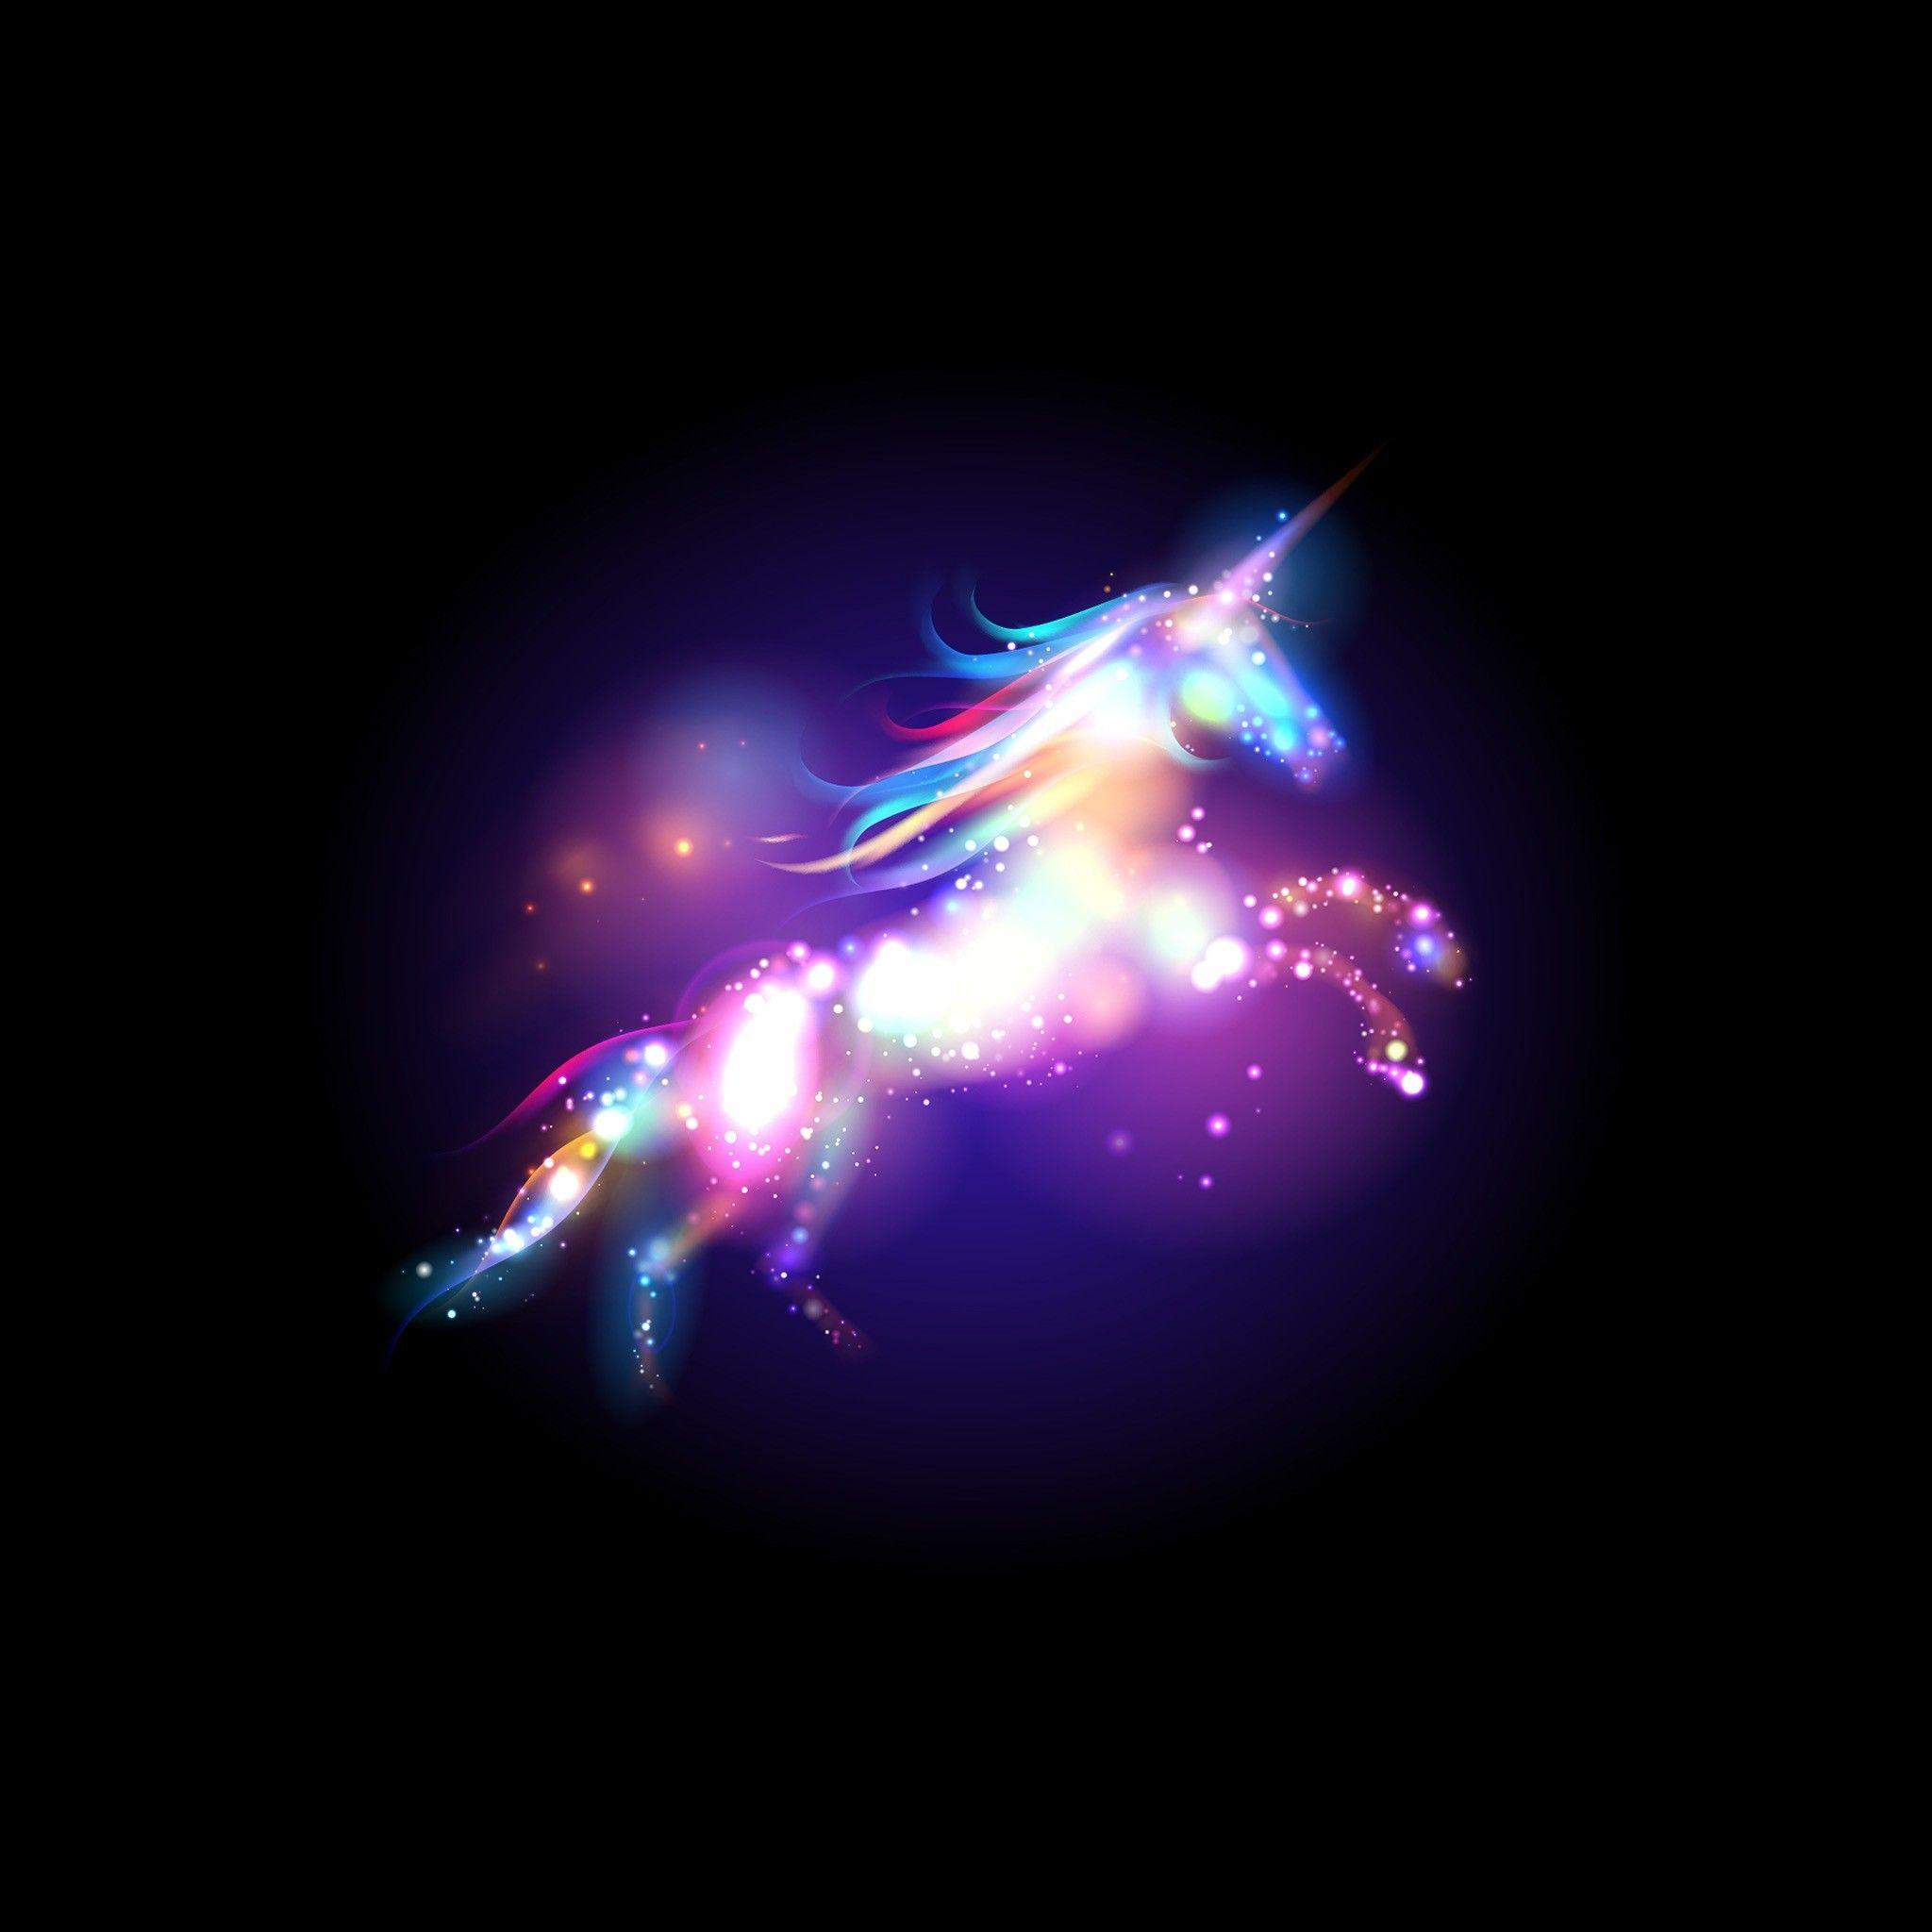 Galaxy Unicorn Wallpapers Wallpaper Cave